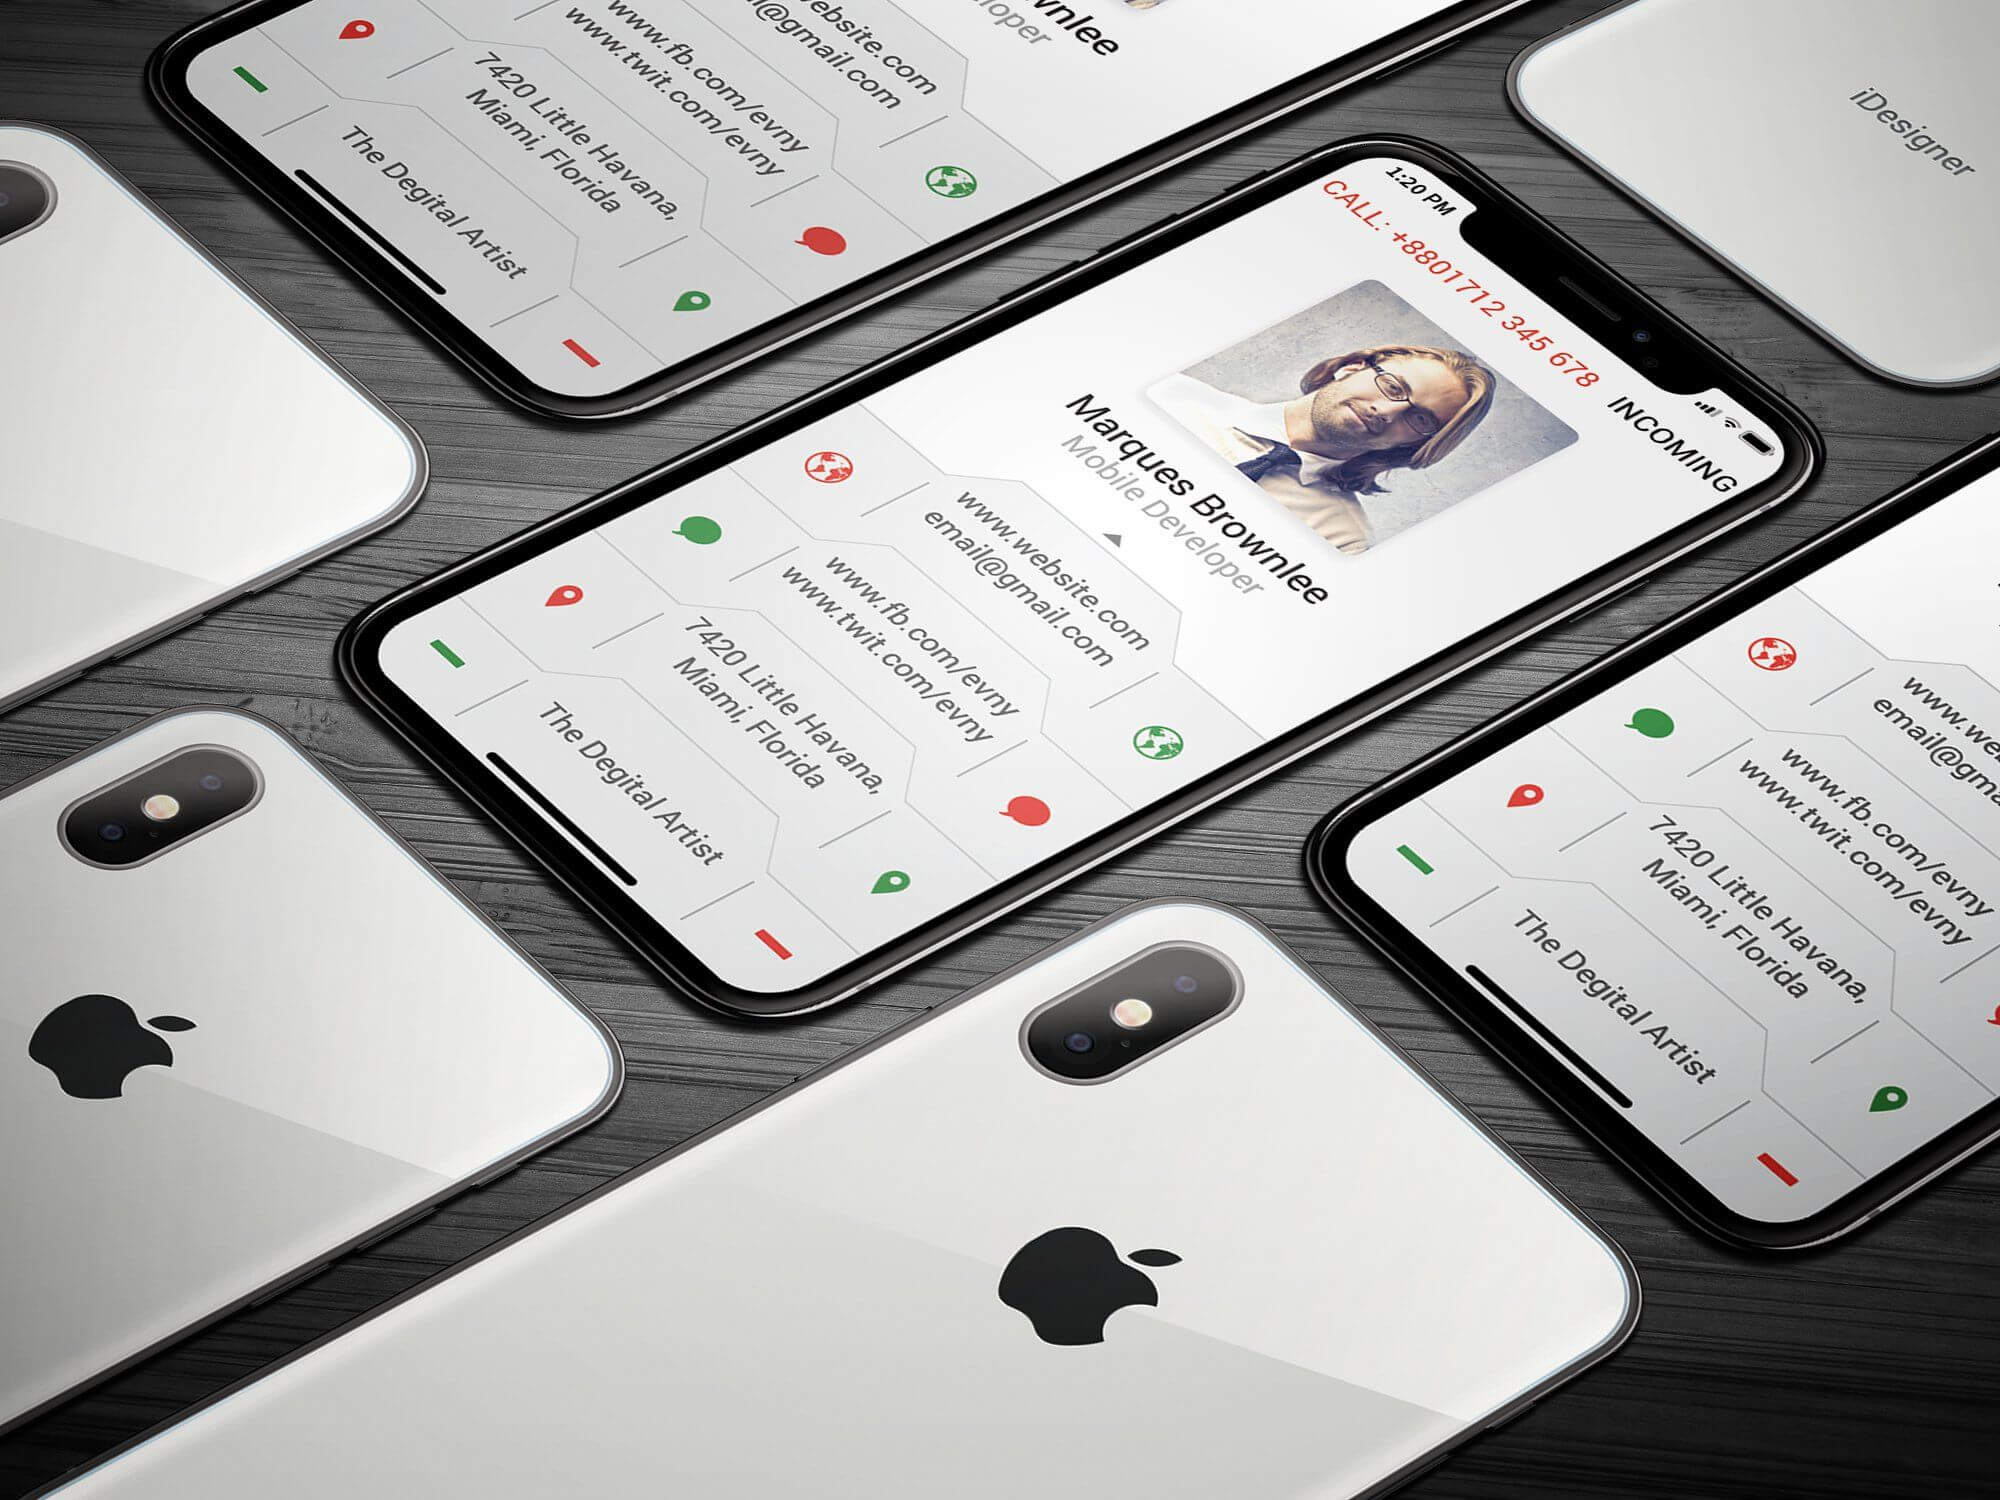 Iphone X Business Card #bleed#dpi#li#features | Business in Iphone Business Card Template